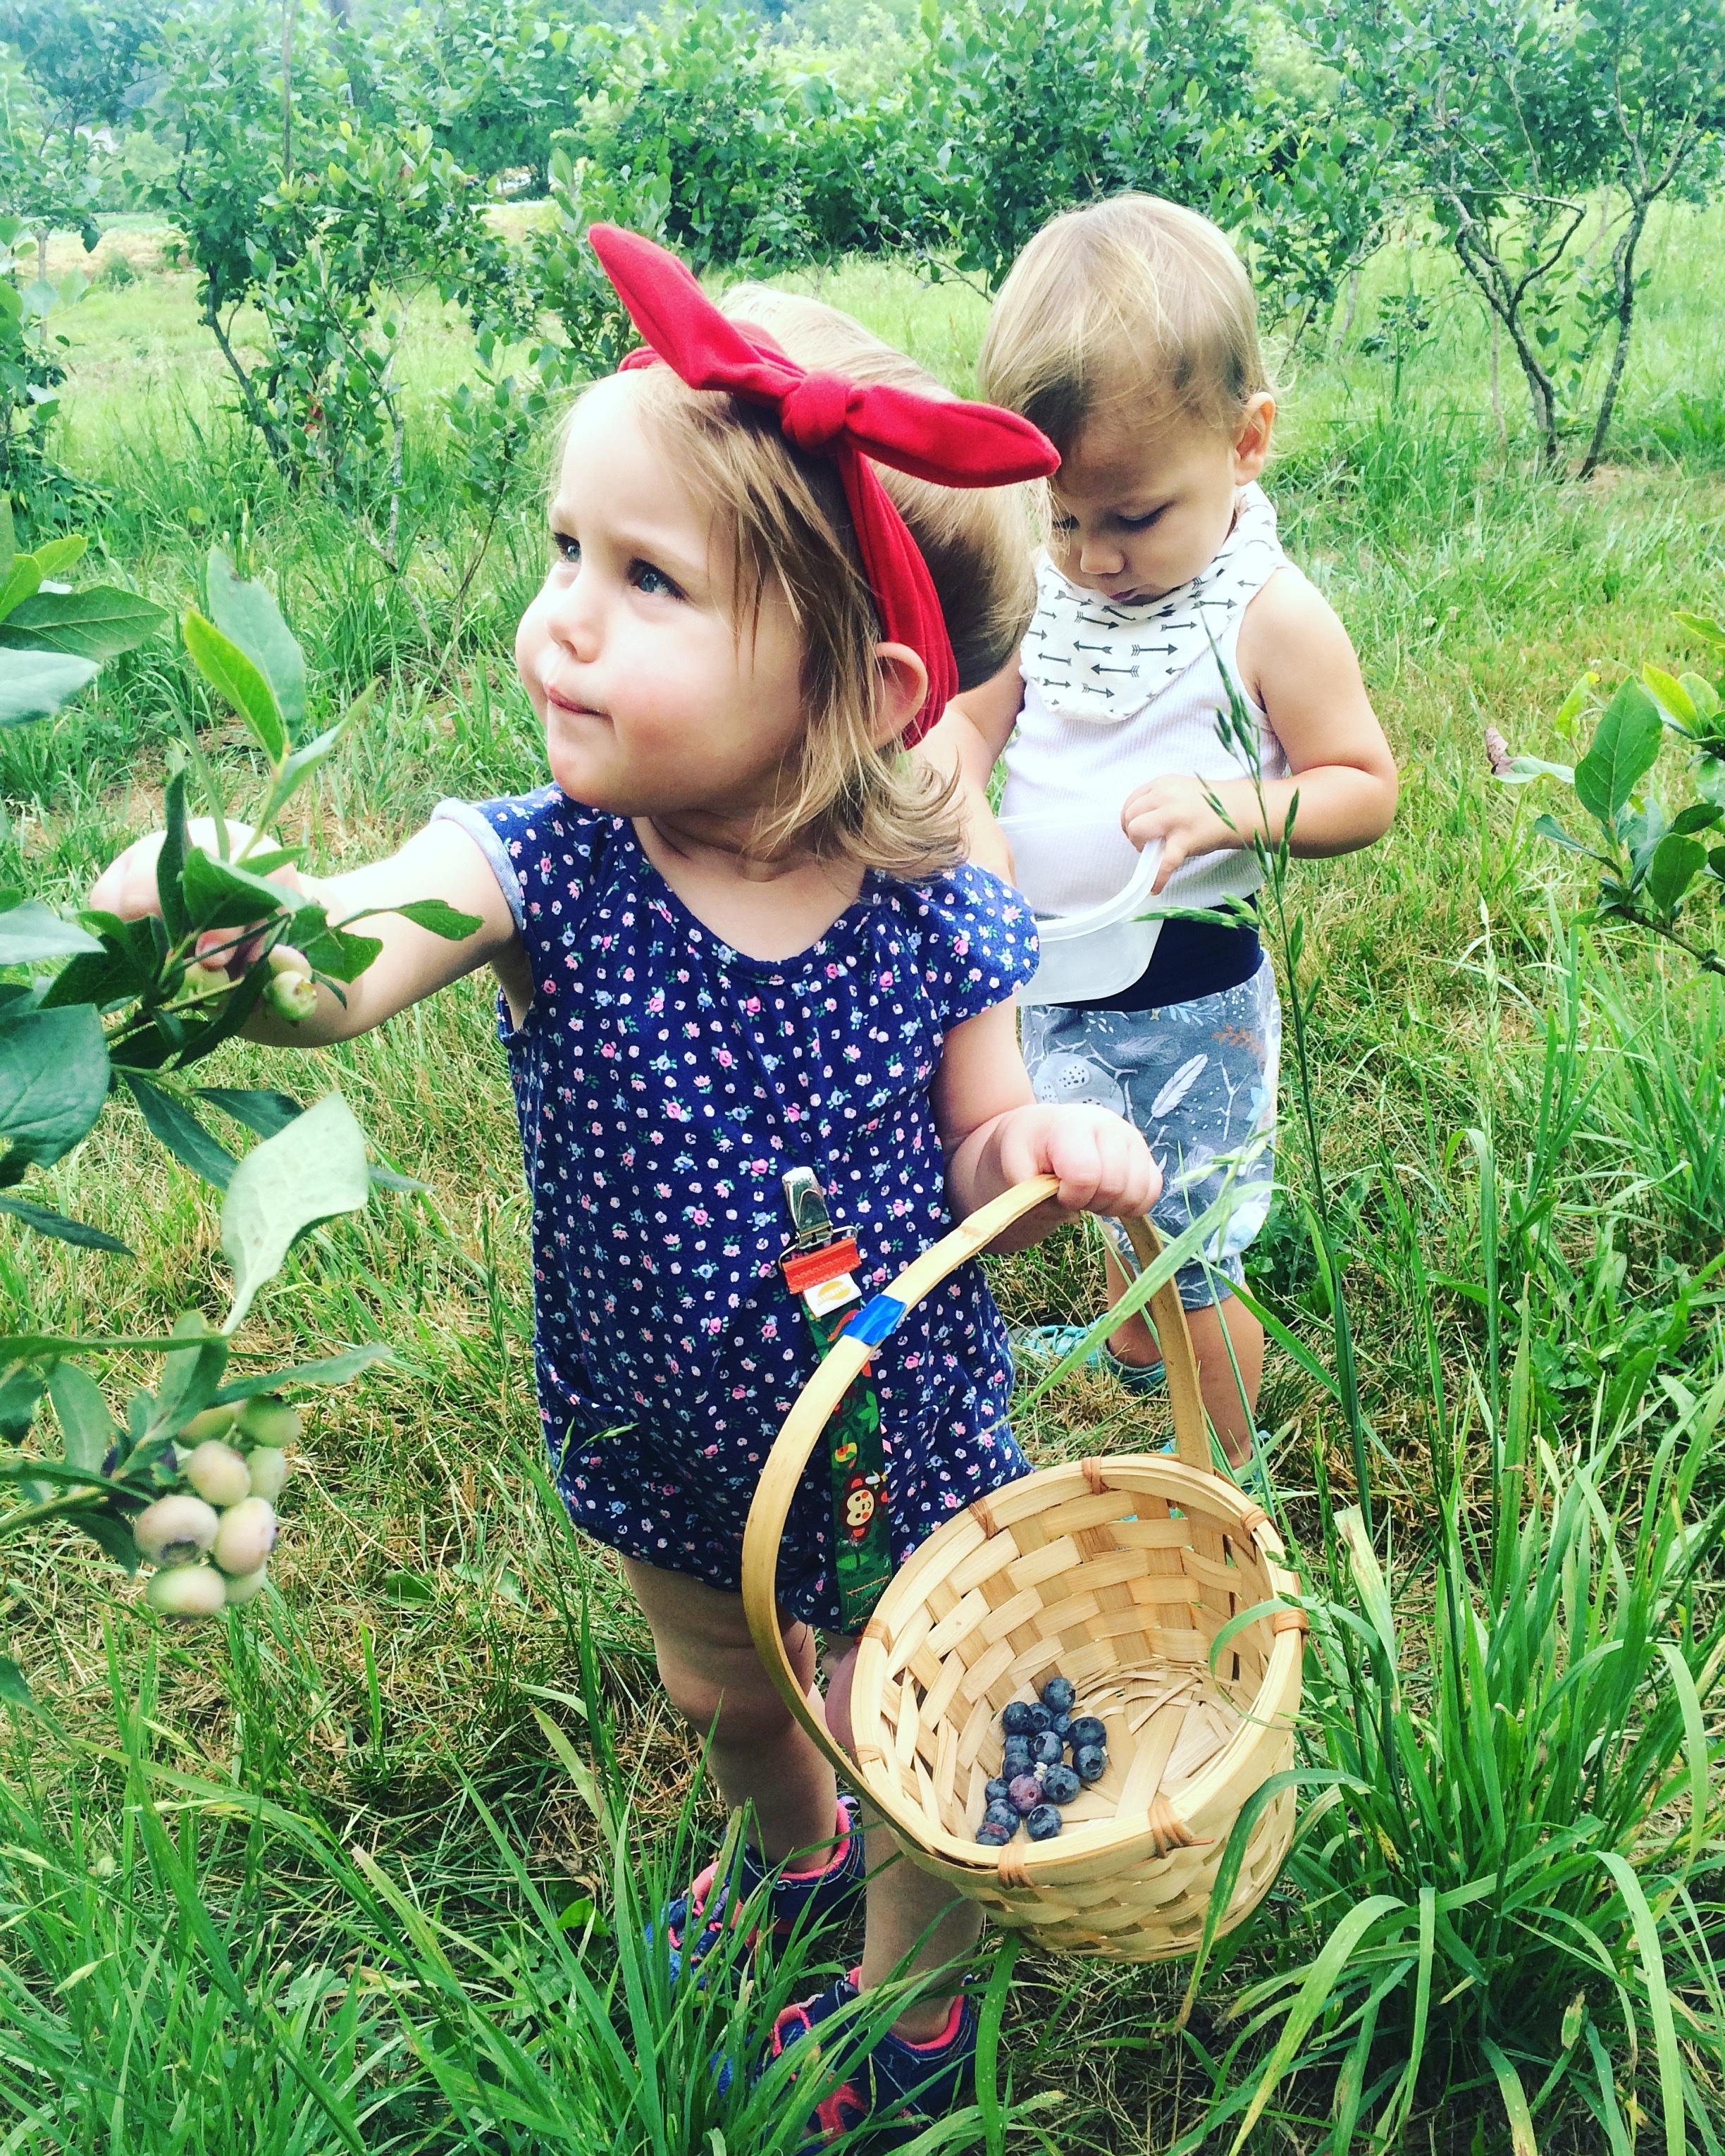 Juniper blueberries